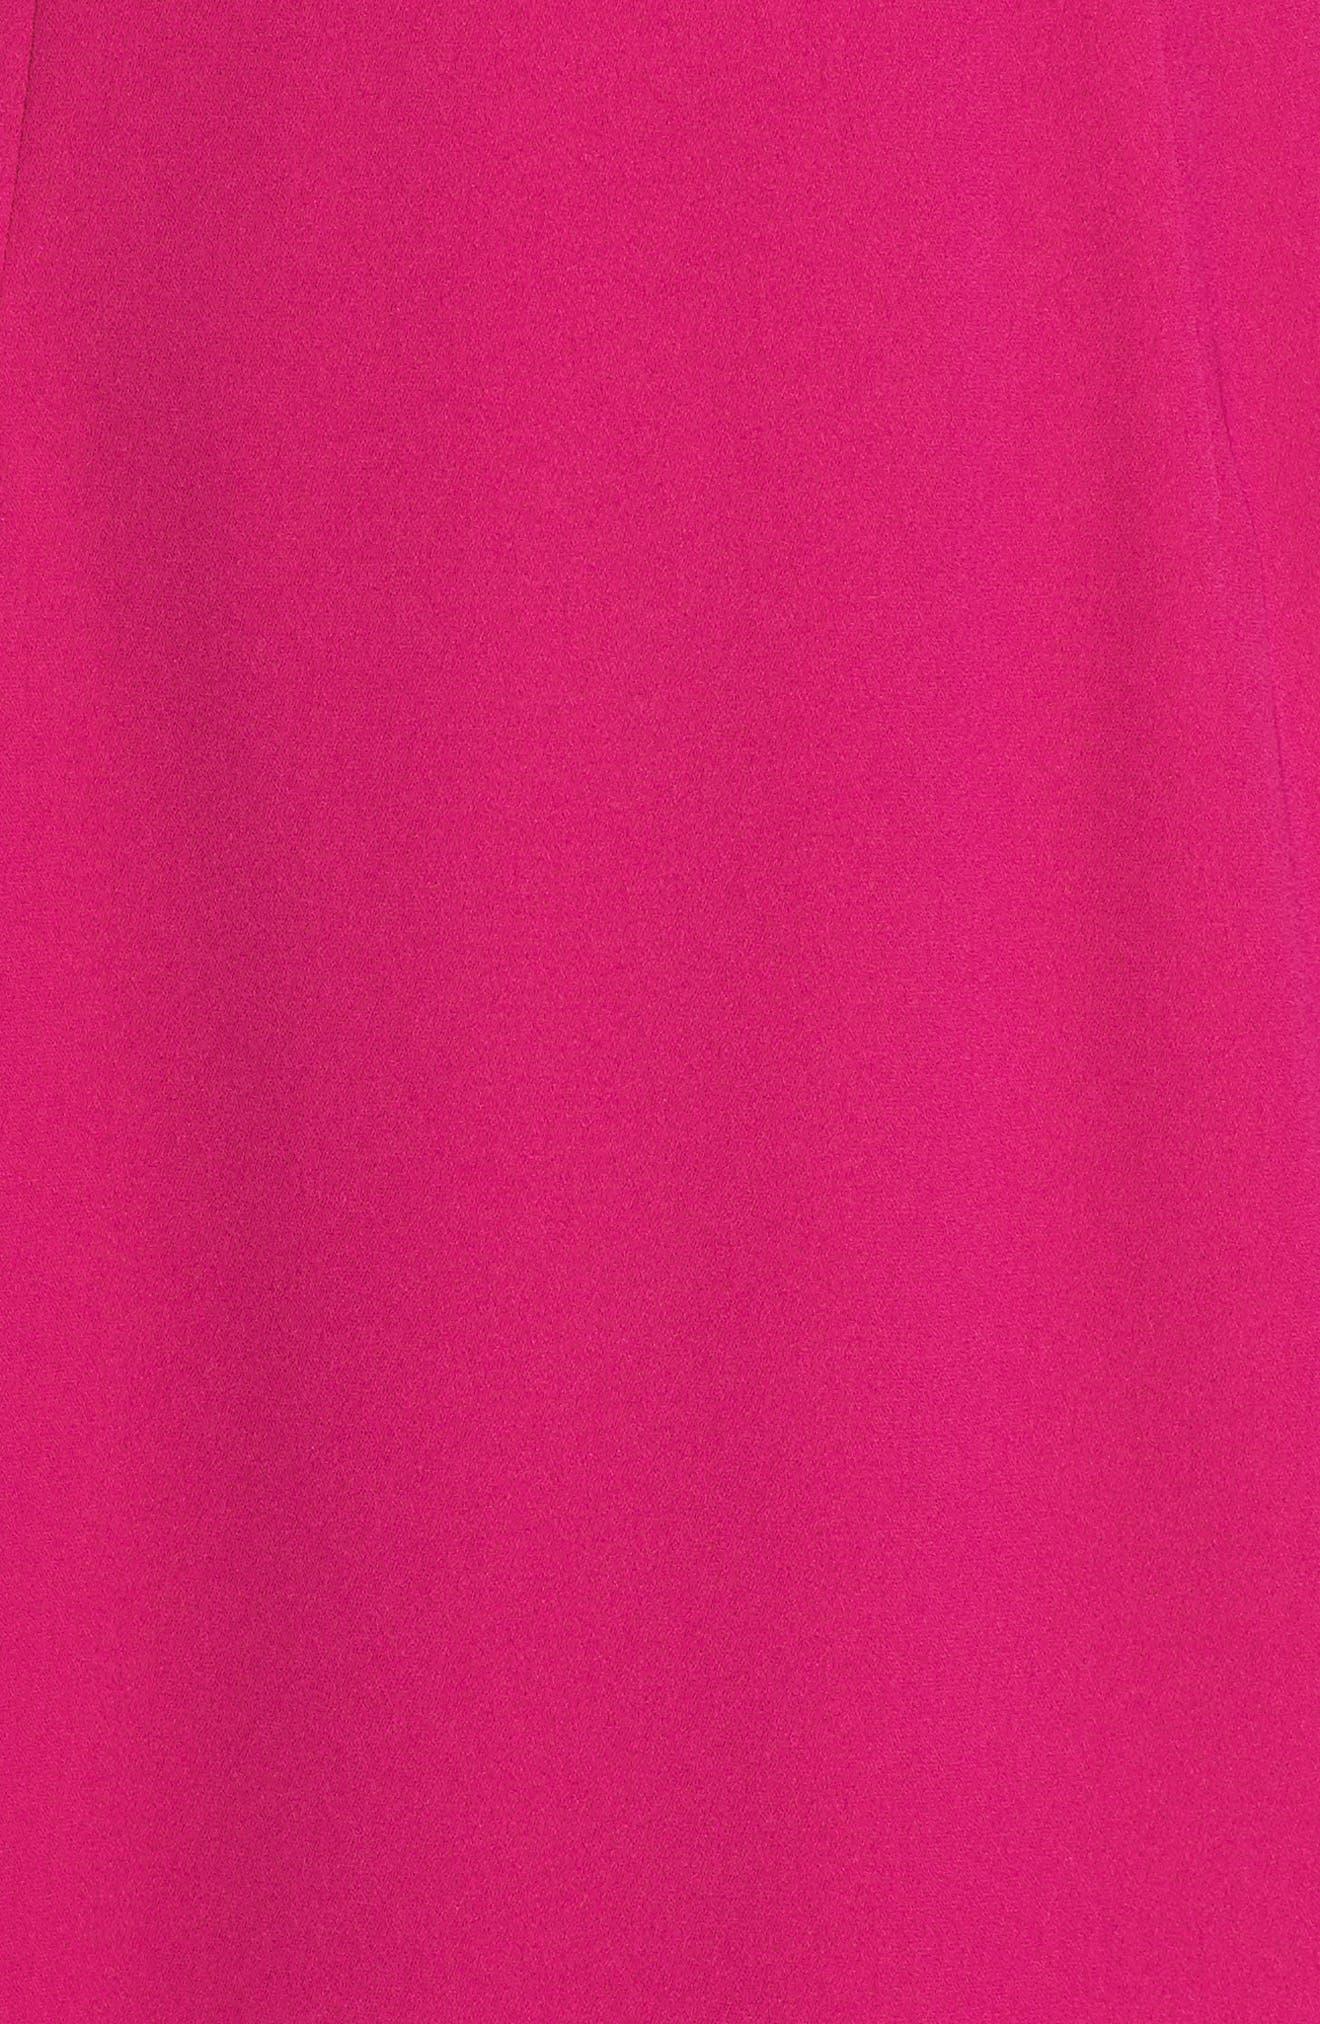 Lace Back Sheath Dress,                             Alternate thumbnail 12, color,